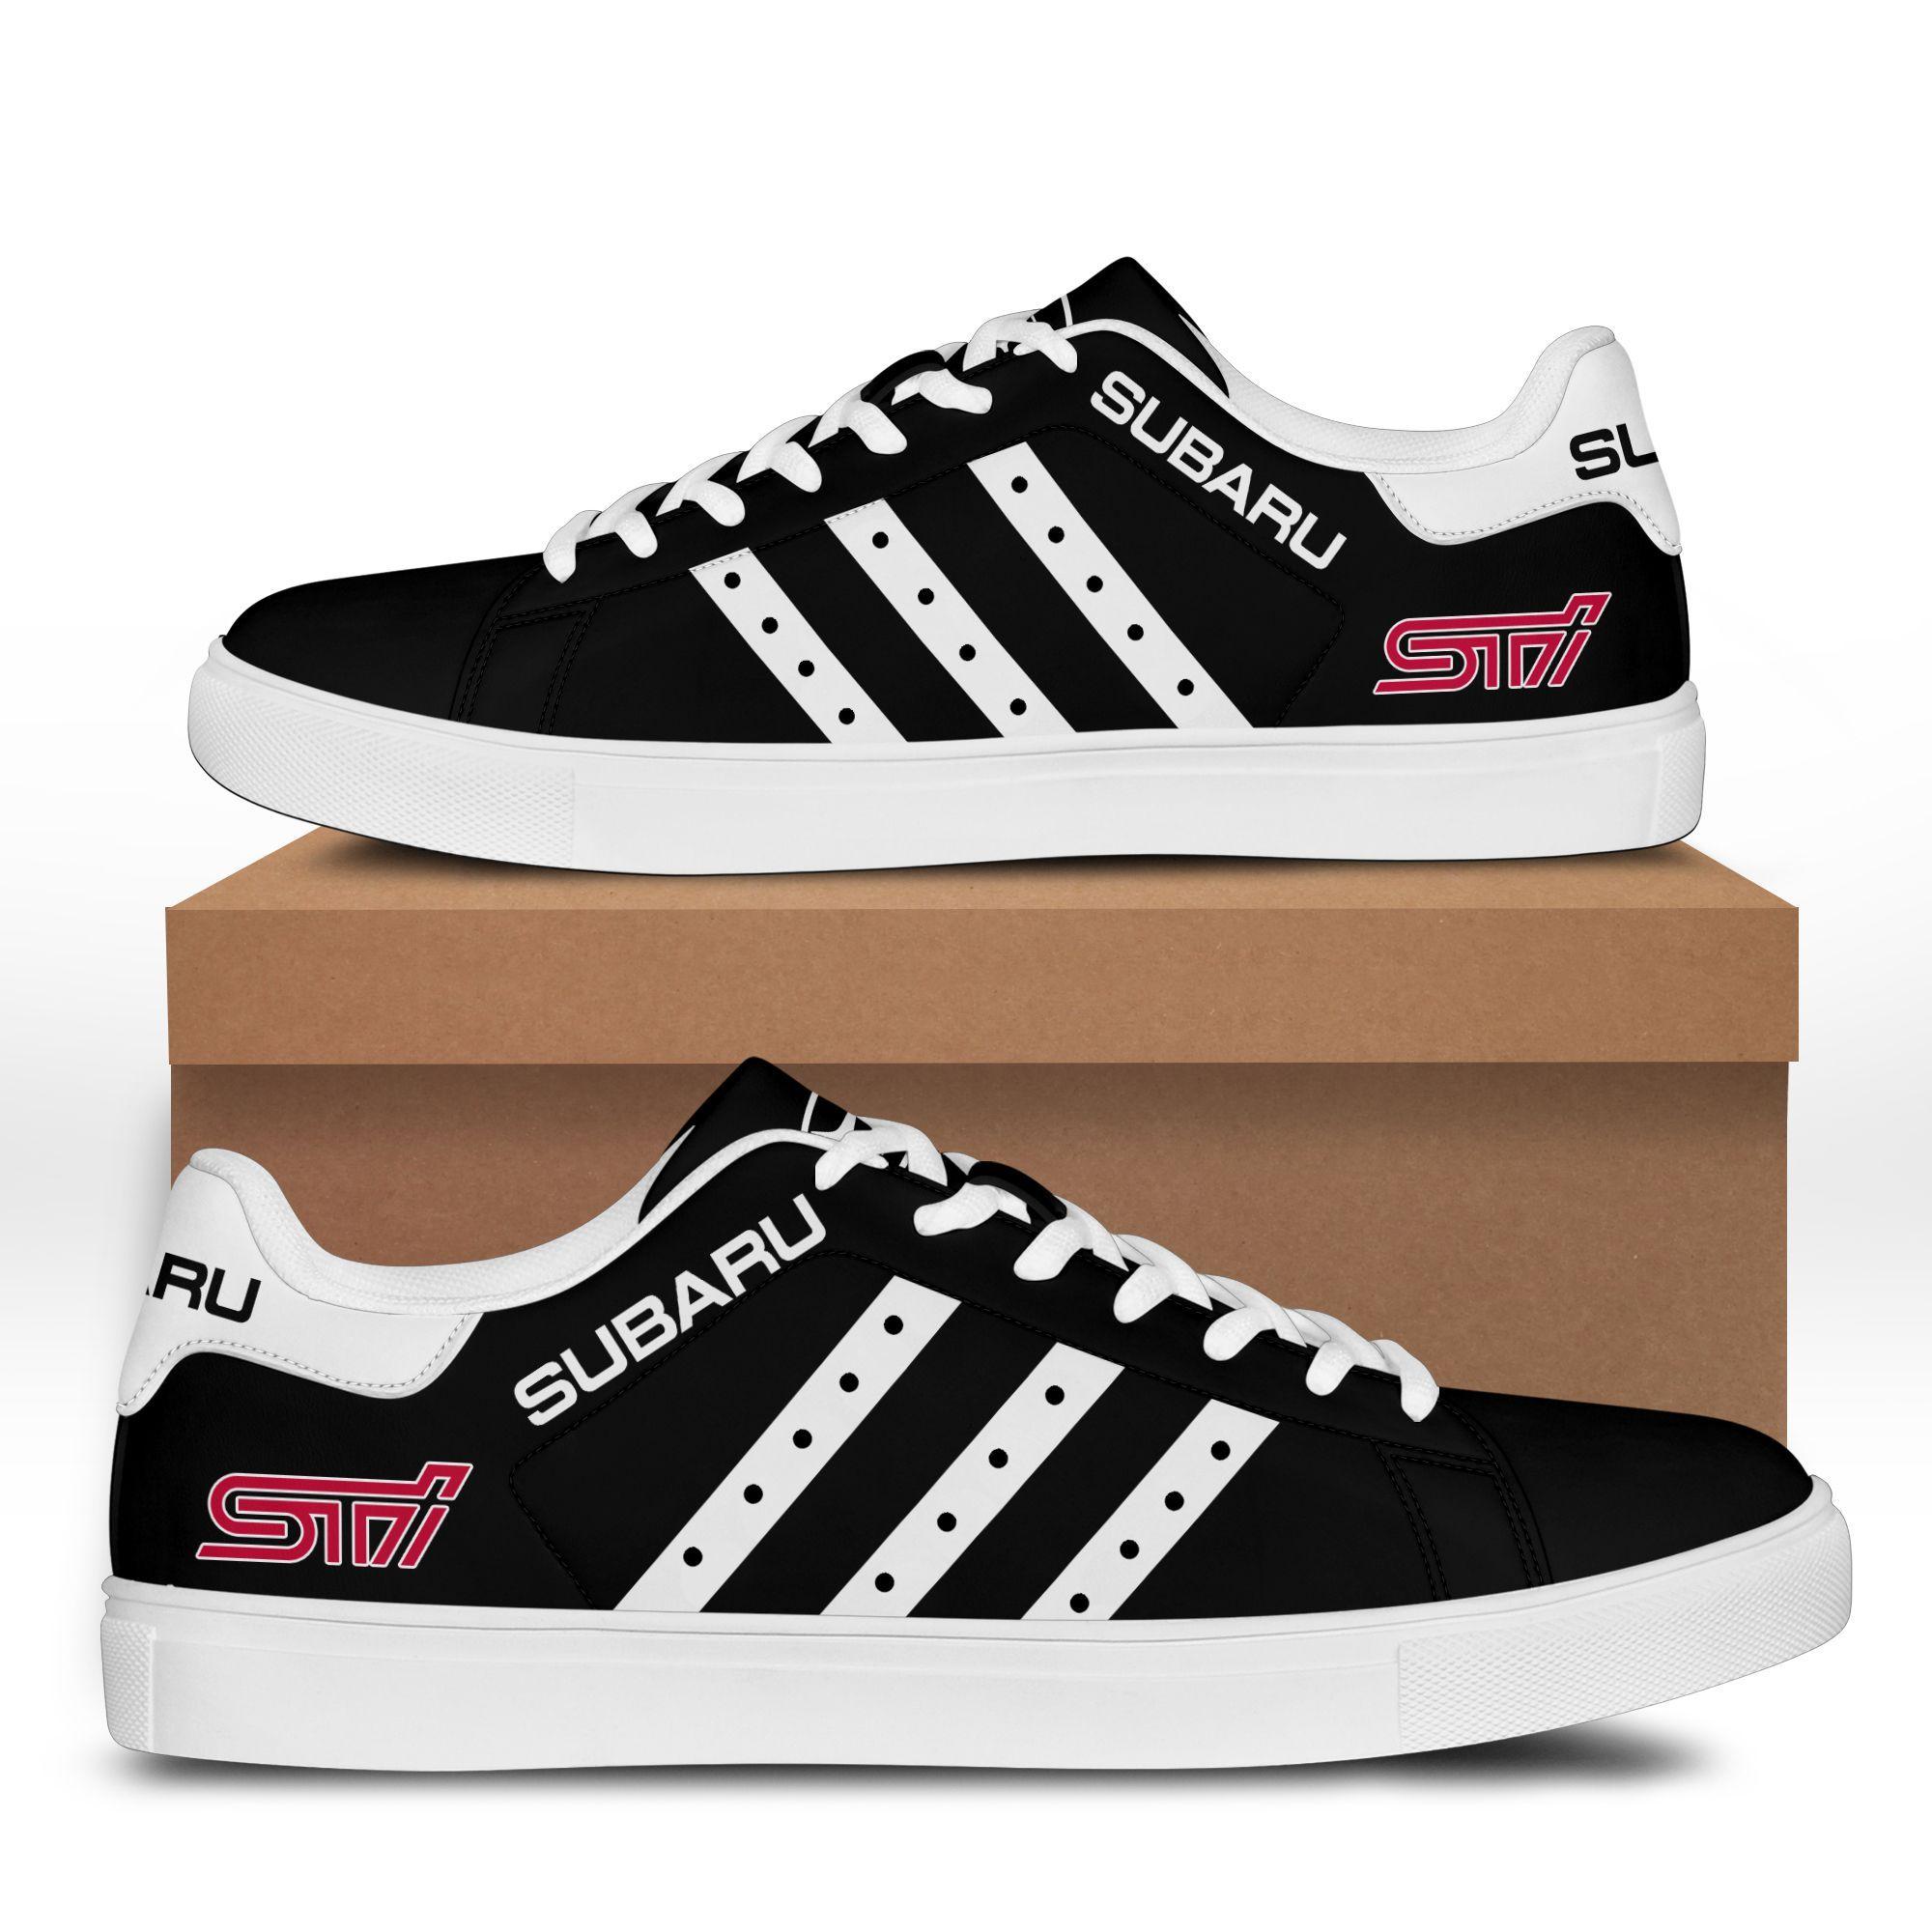 SUBARU STI Black Stan Smith Shoes